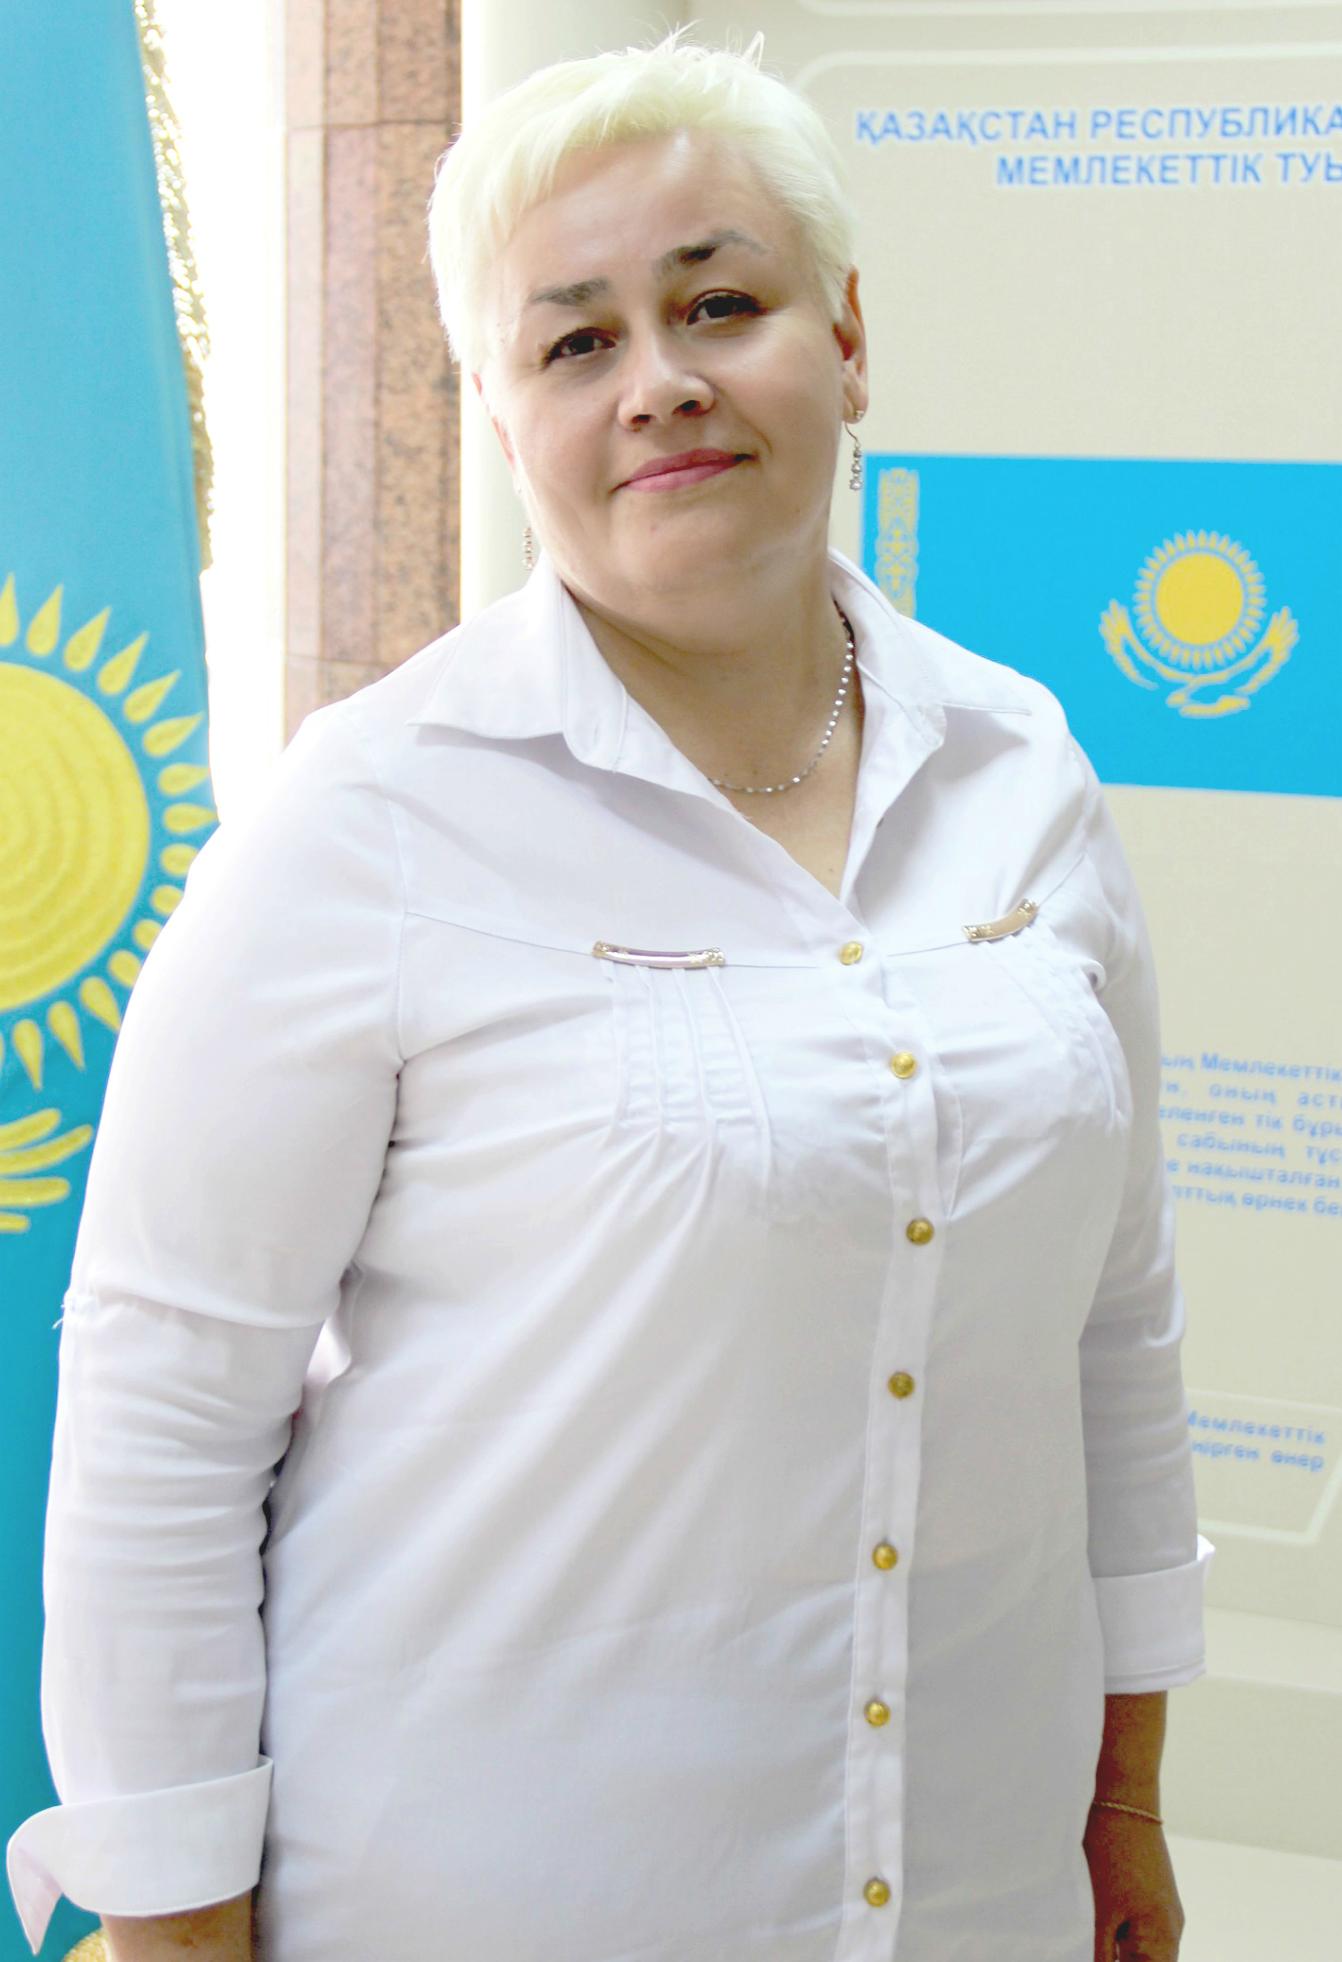 Машинец Татьяна Валерьевна